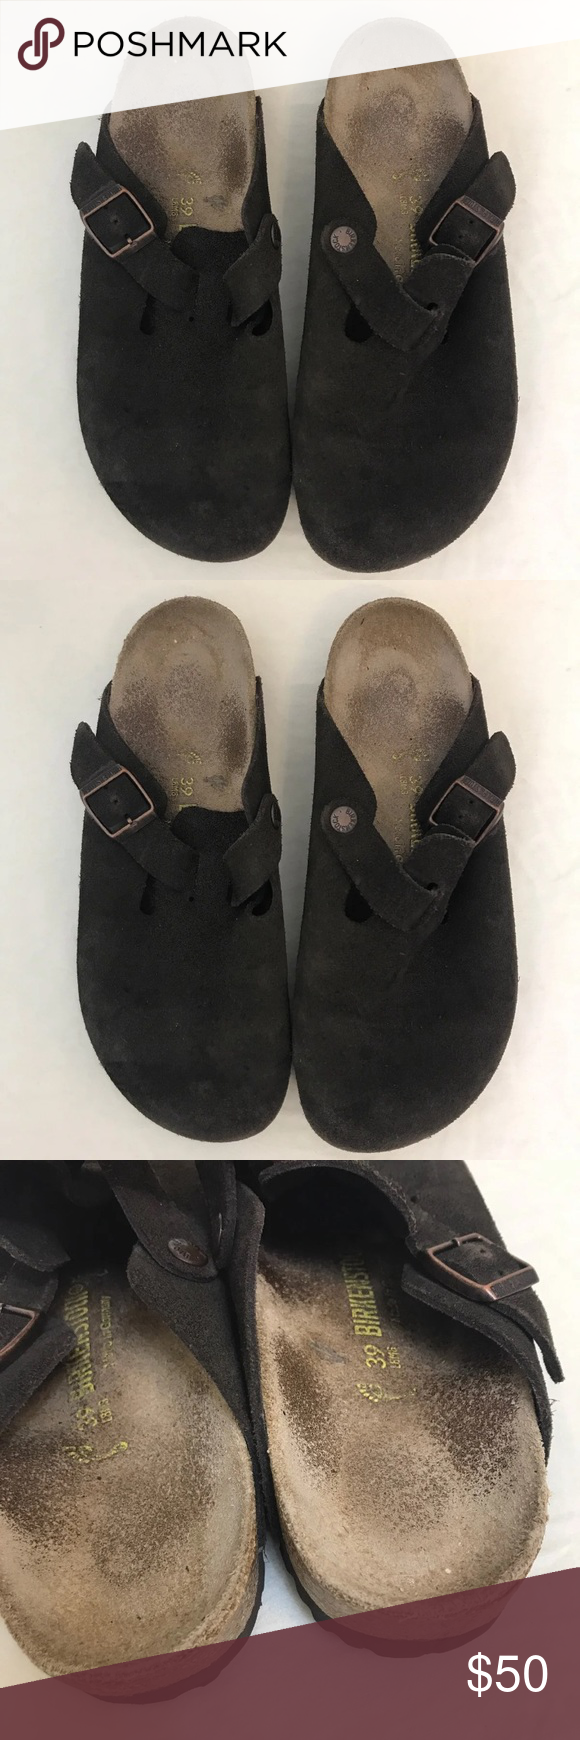 Birkenstock Boston Clogs Sandals size 39 Size : 39